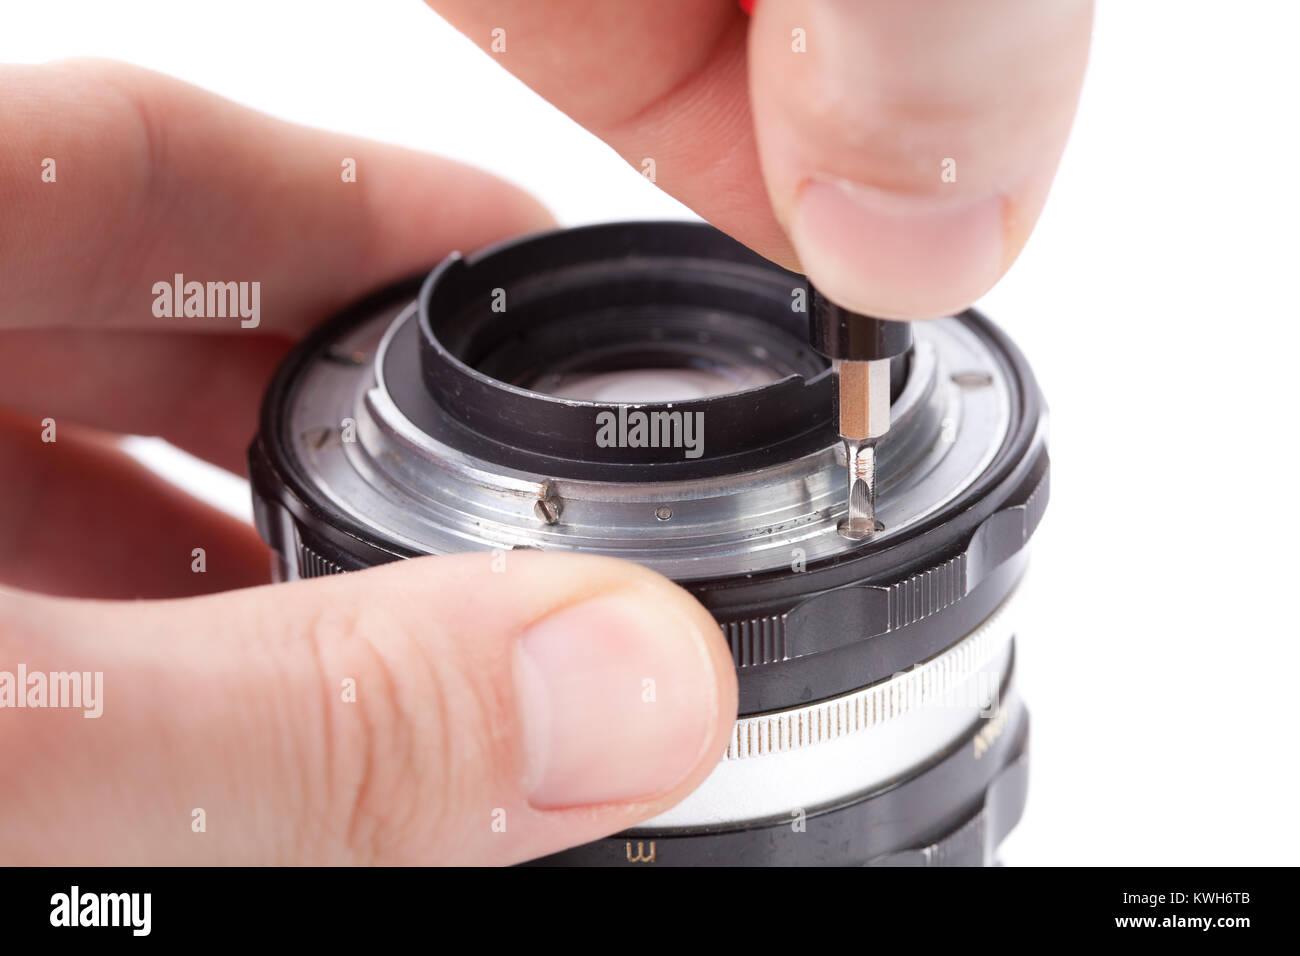 Technician repairing lens, removing lens mount - Stock Image